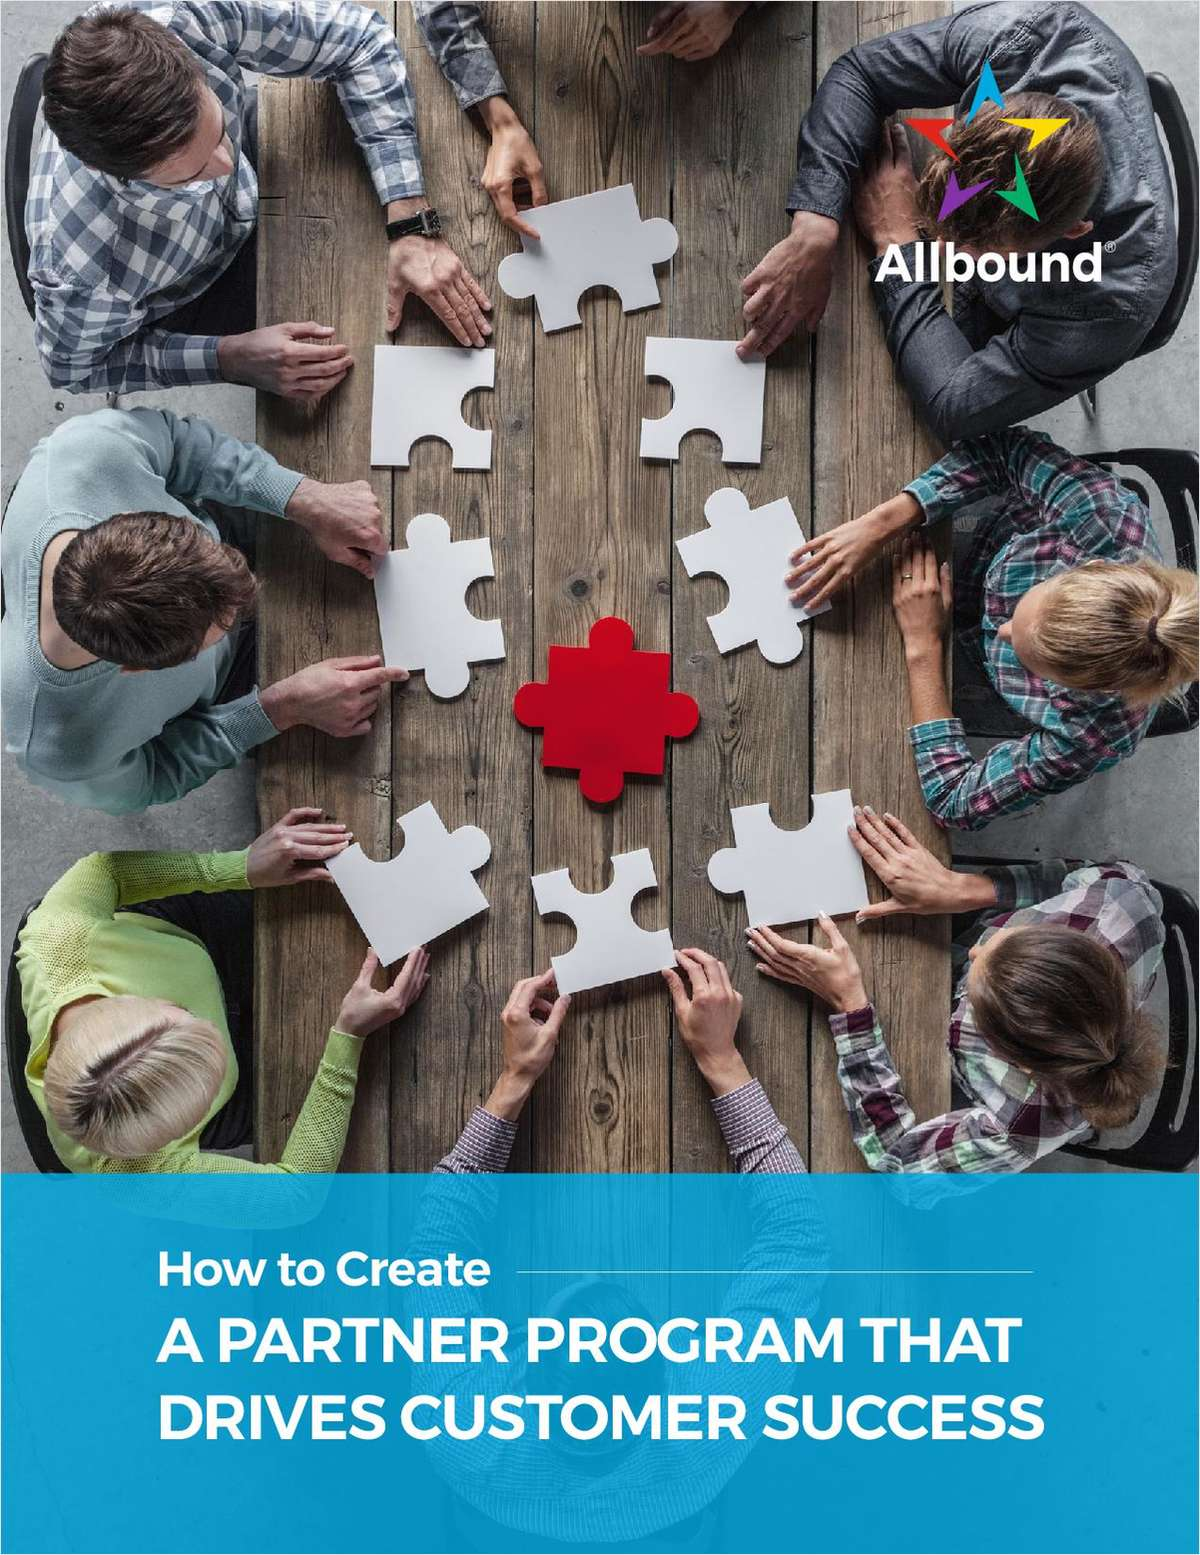 Ebook: Creating a Partner Program That Drives Customer Success